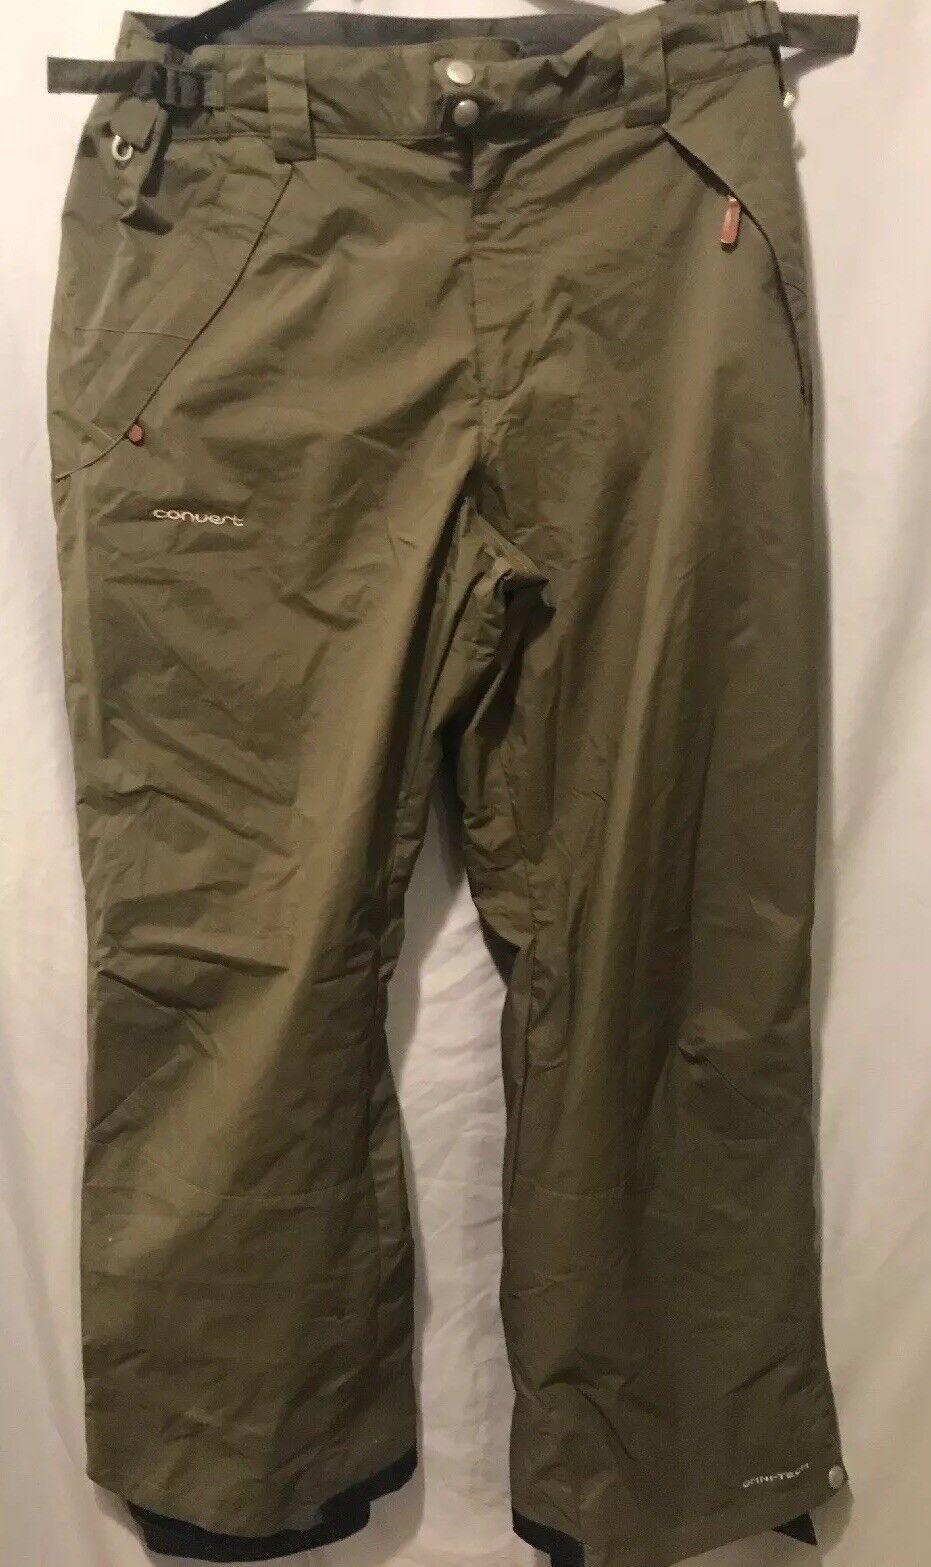 COLUMBIA Congreen Omni-Tech Nylon Ski Snow Pants Mens Large Khaki Green TS8